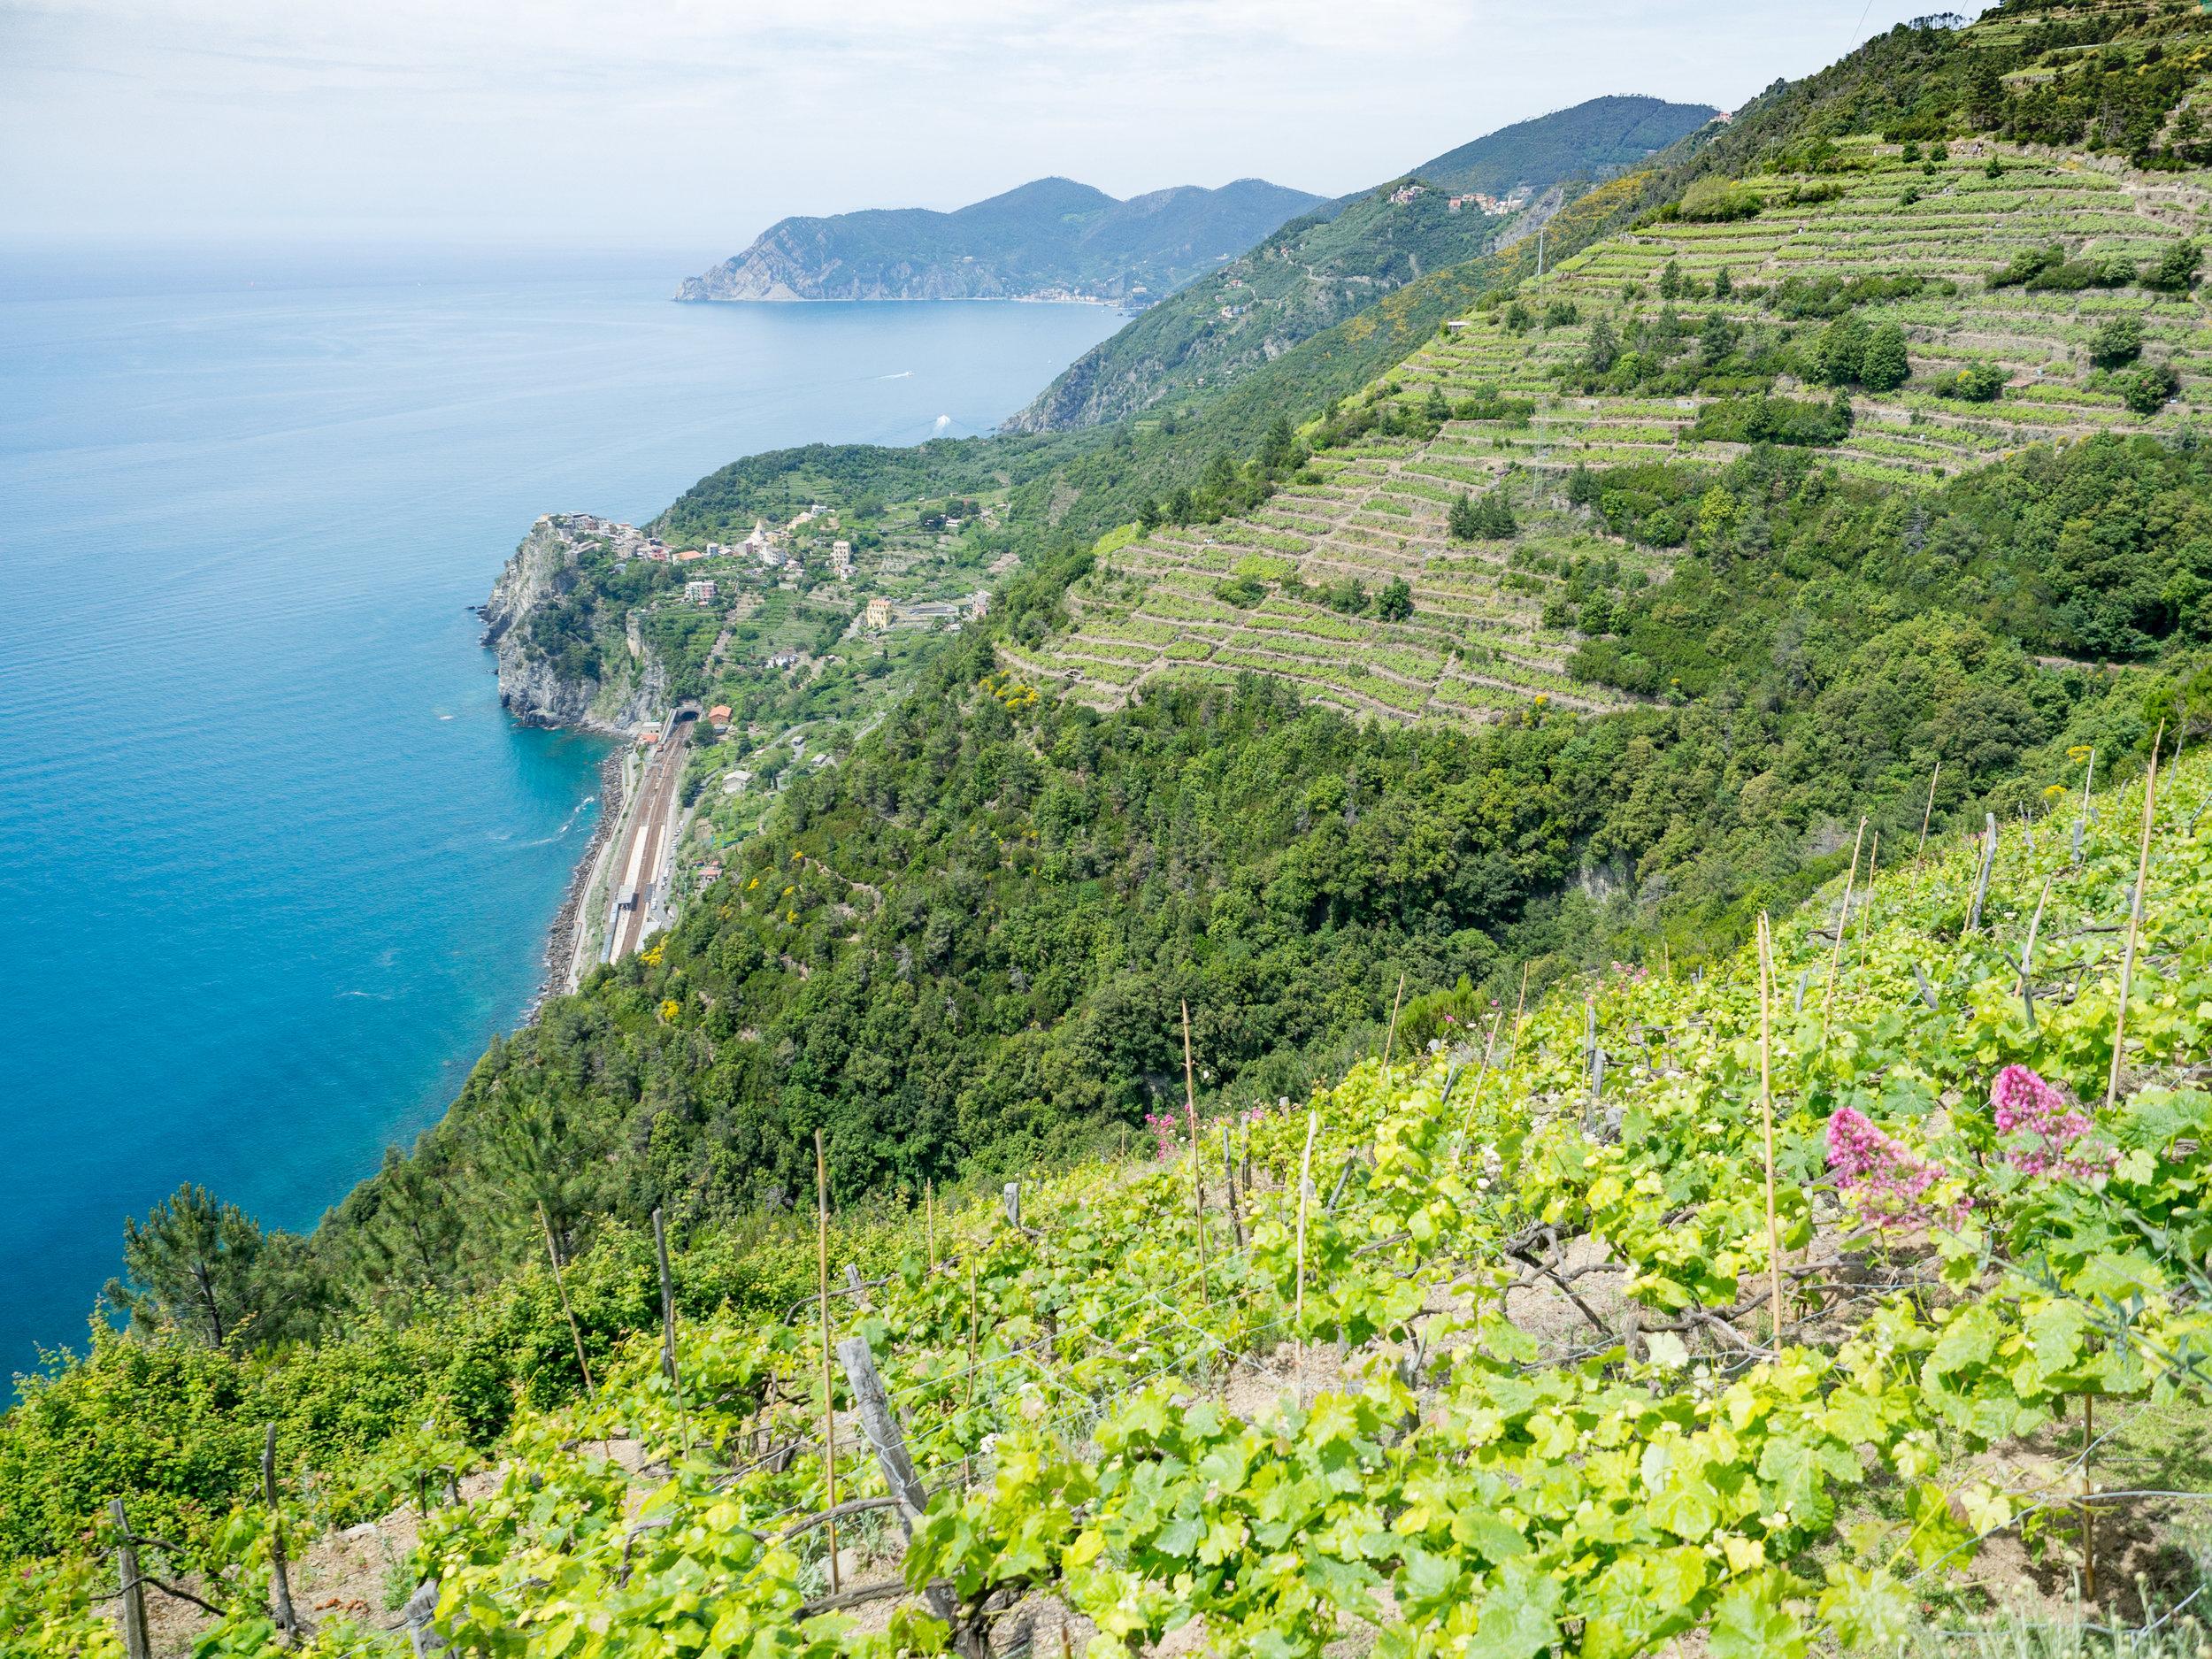 Dream of  hiking in Cinque Terre ?